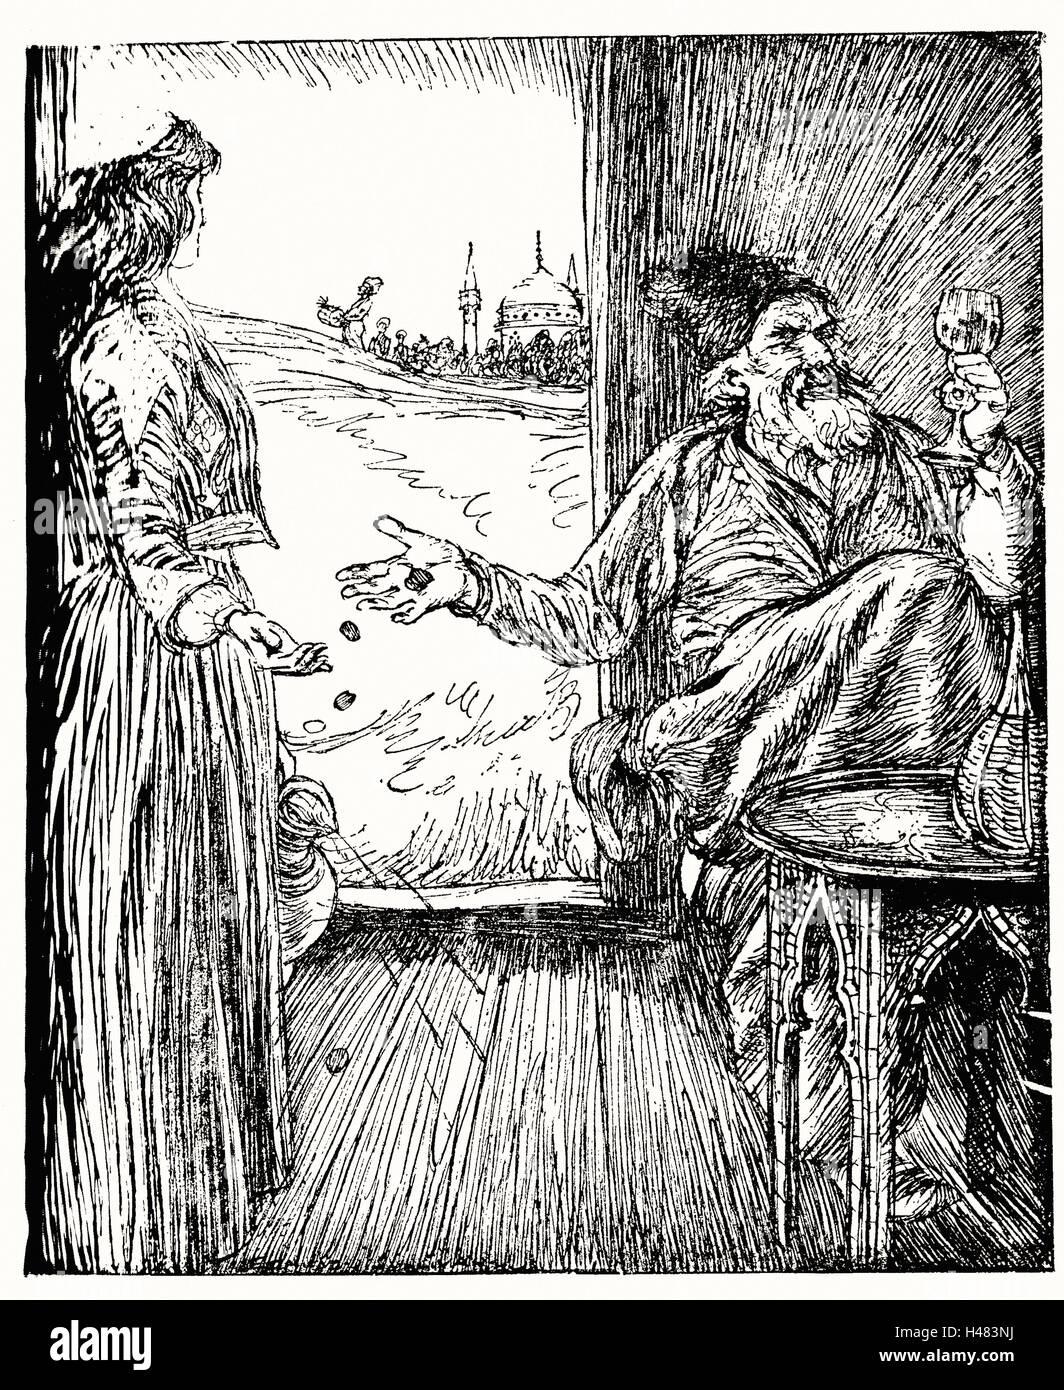 Edmund J Sullivan illustrazioni per il Rubaiyat di Omar Khayyam prima versione quartina Immagini Stock